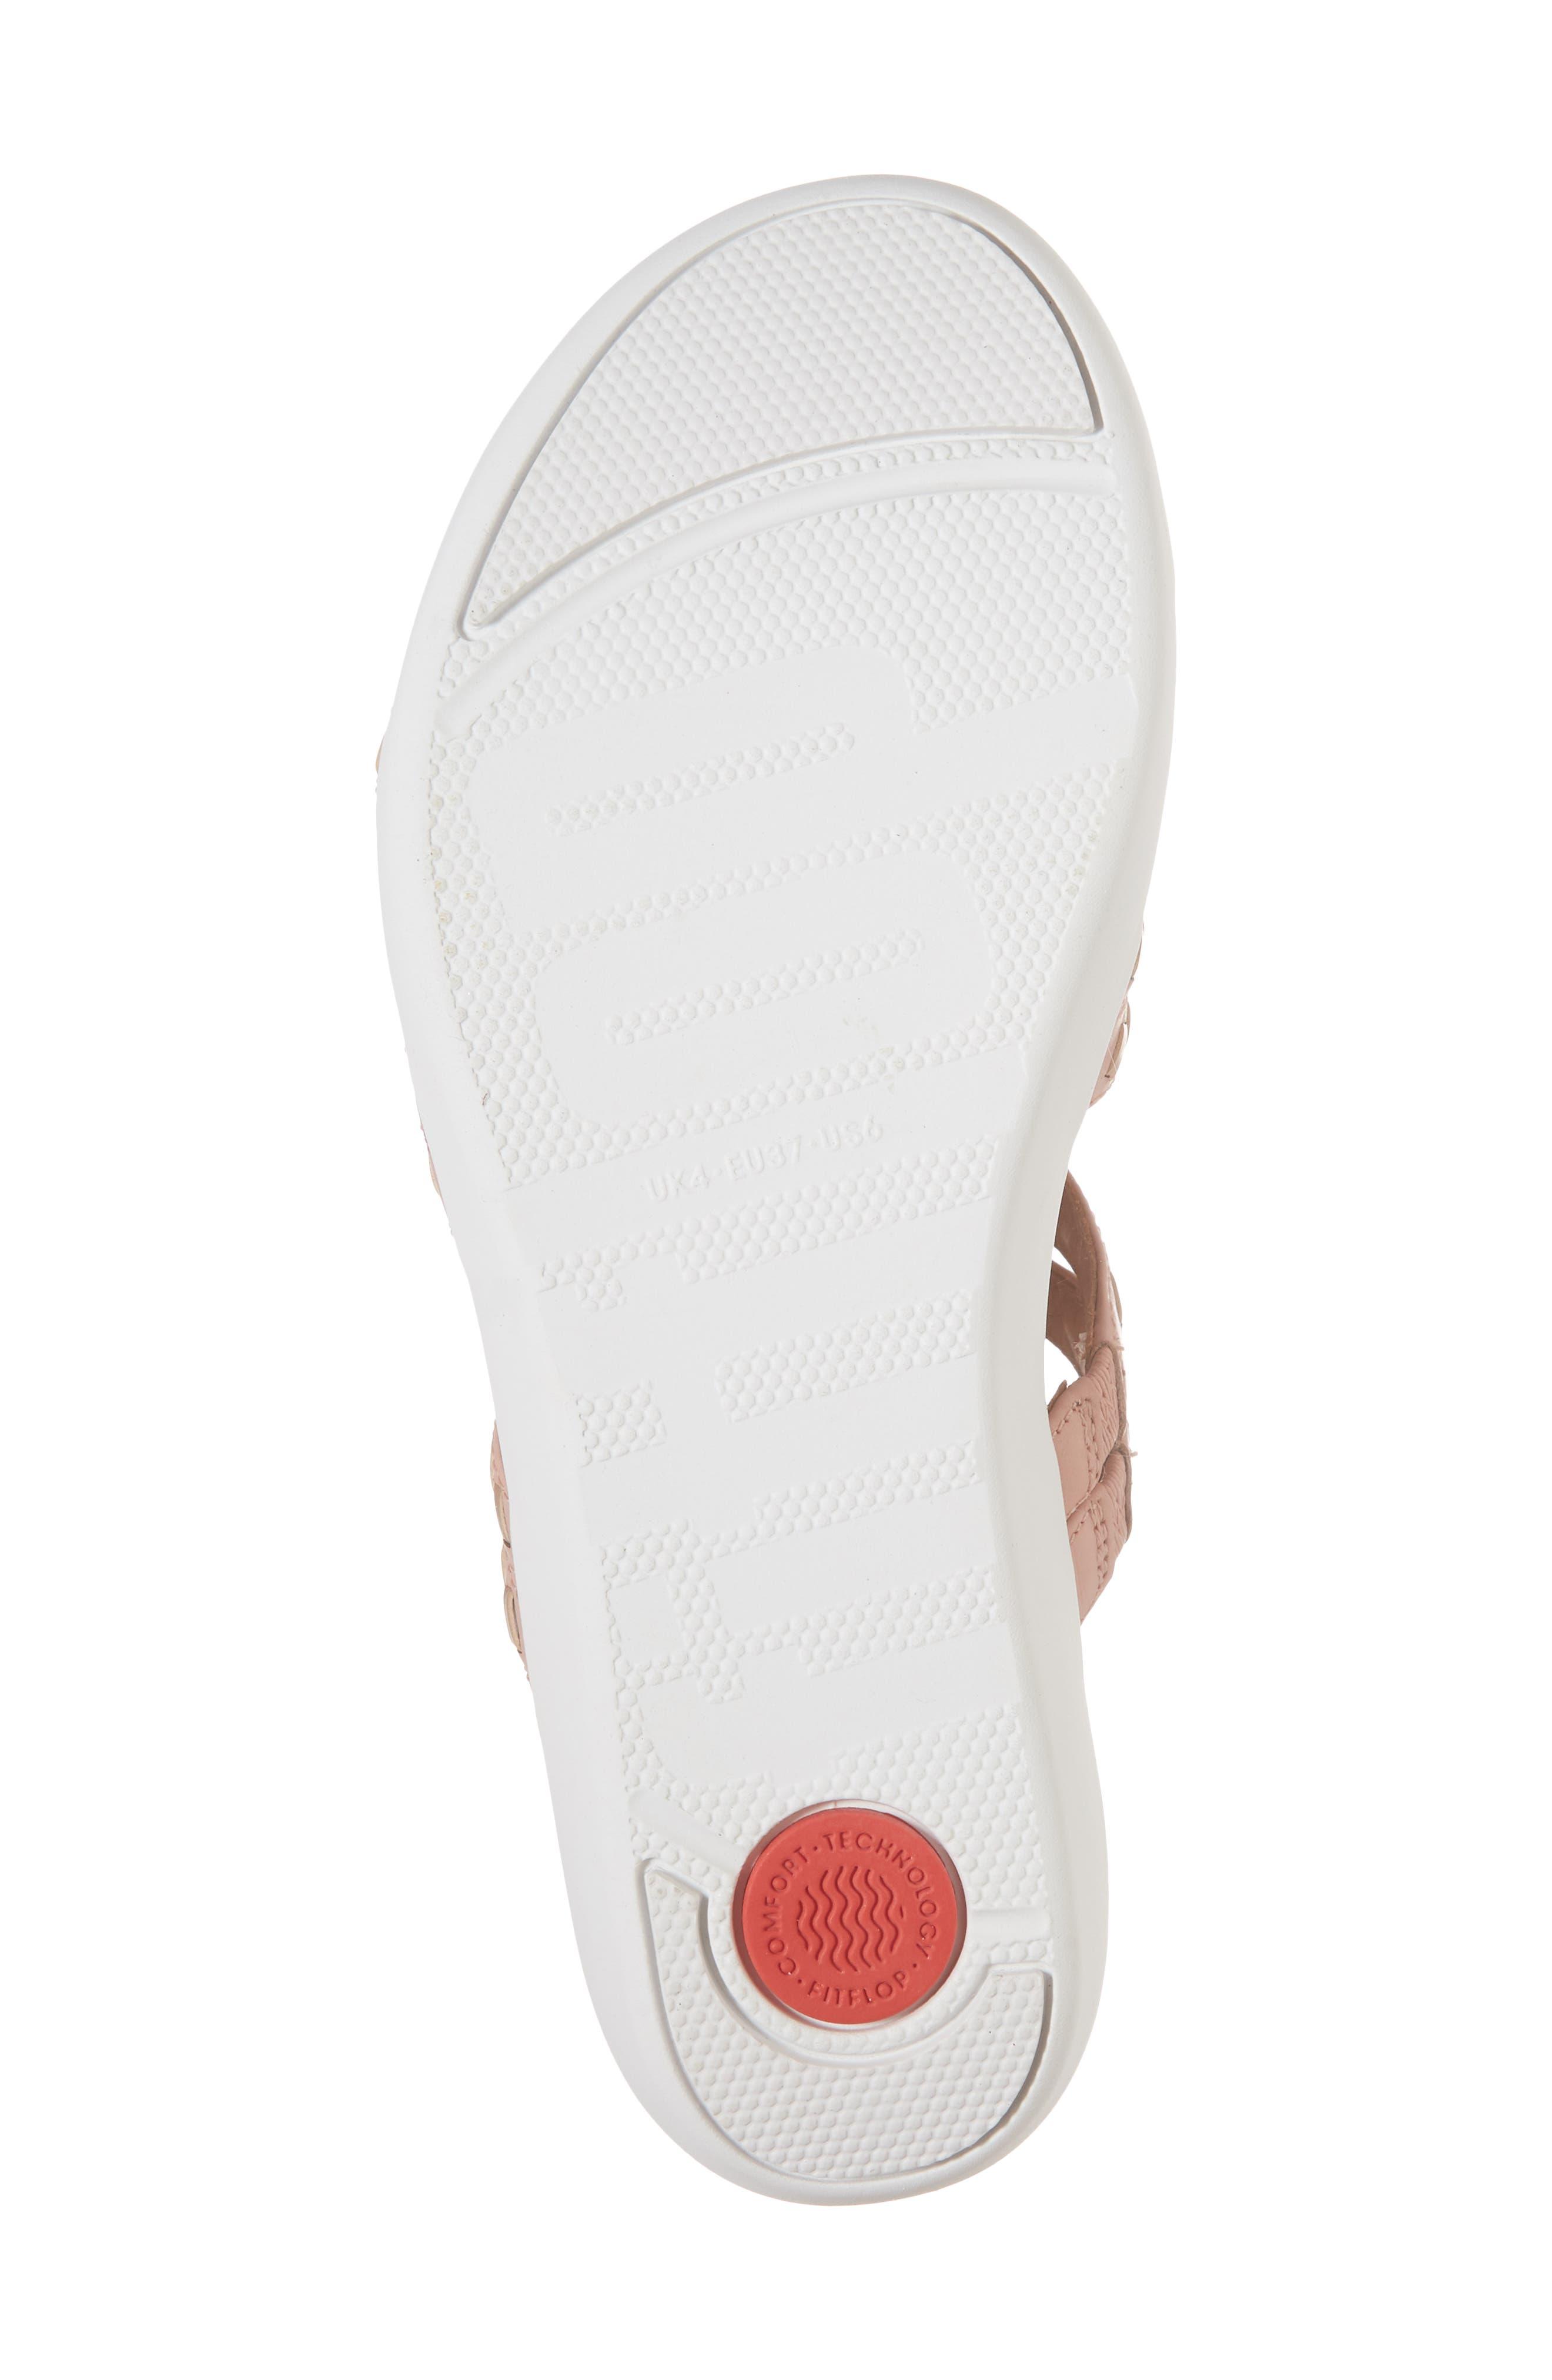 Strata Gladiator Sandal,                             Alternate thumbnail 6, color,                             DUSKY PINK LEATHER